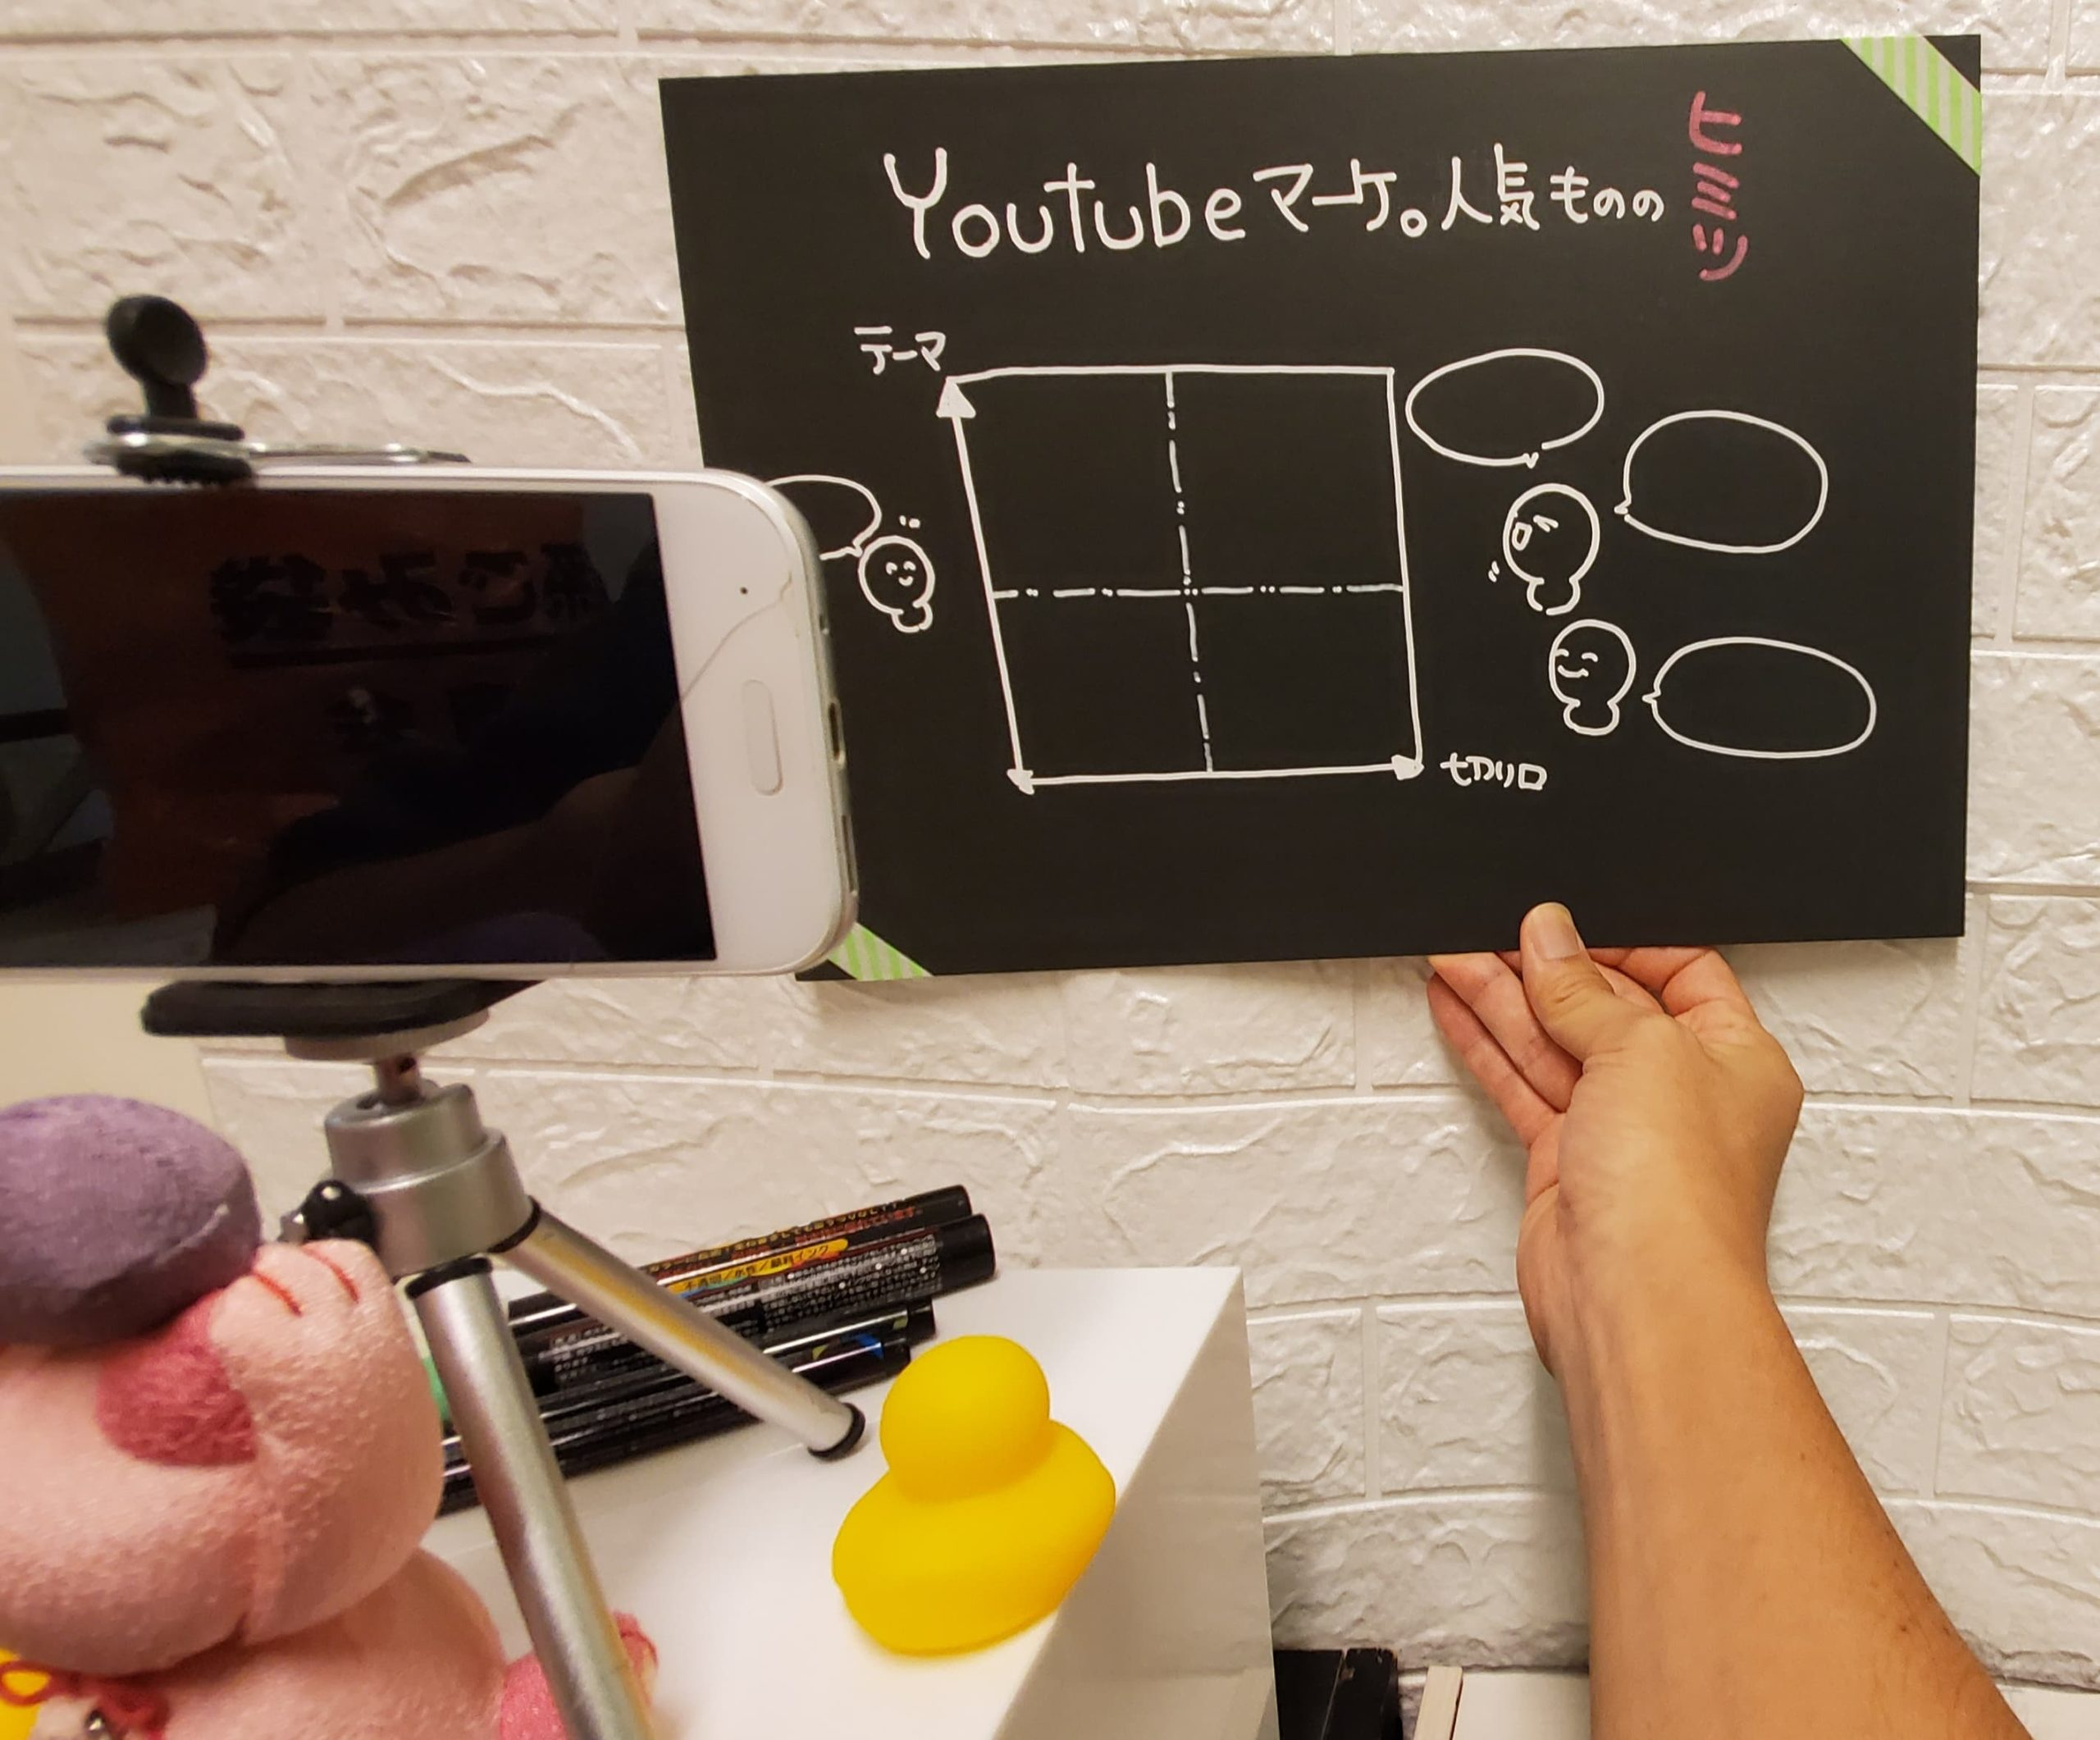 Youtubeマーケで発見。人気者が取り扱うテーマと切り口